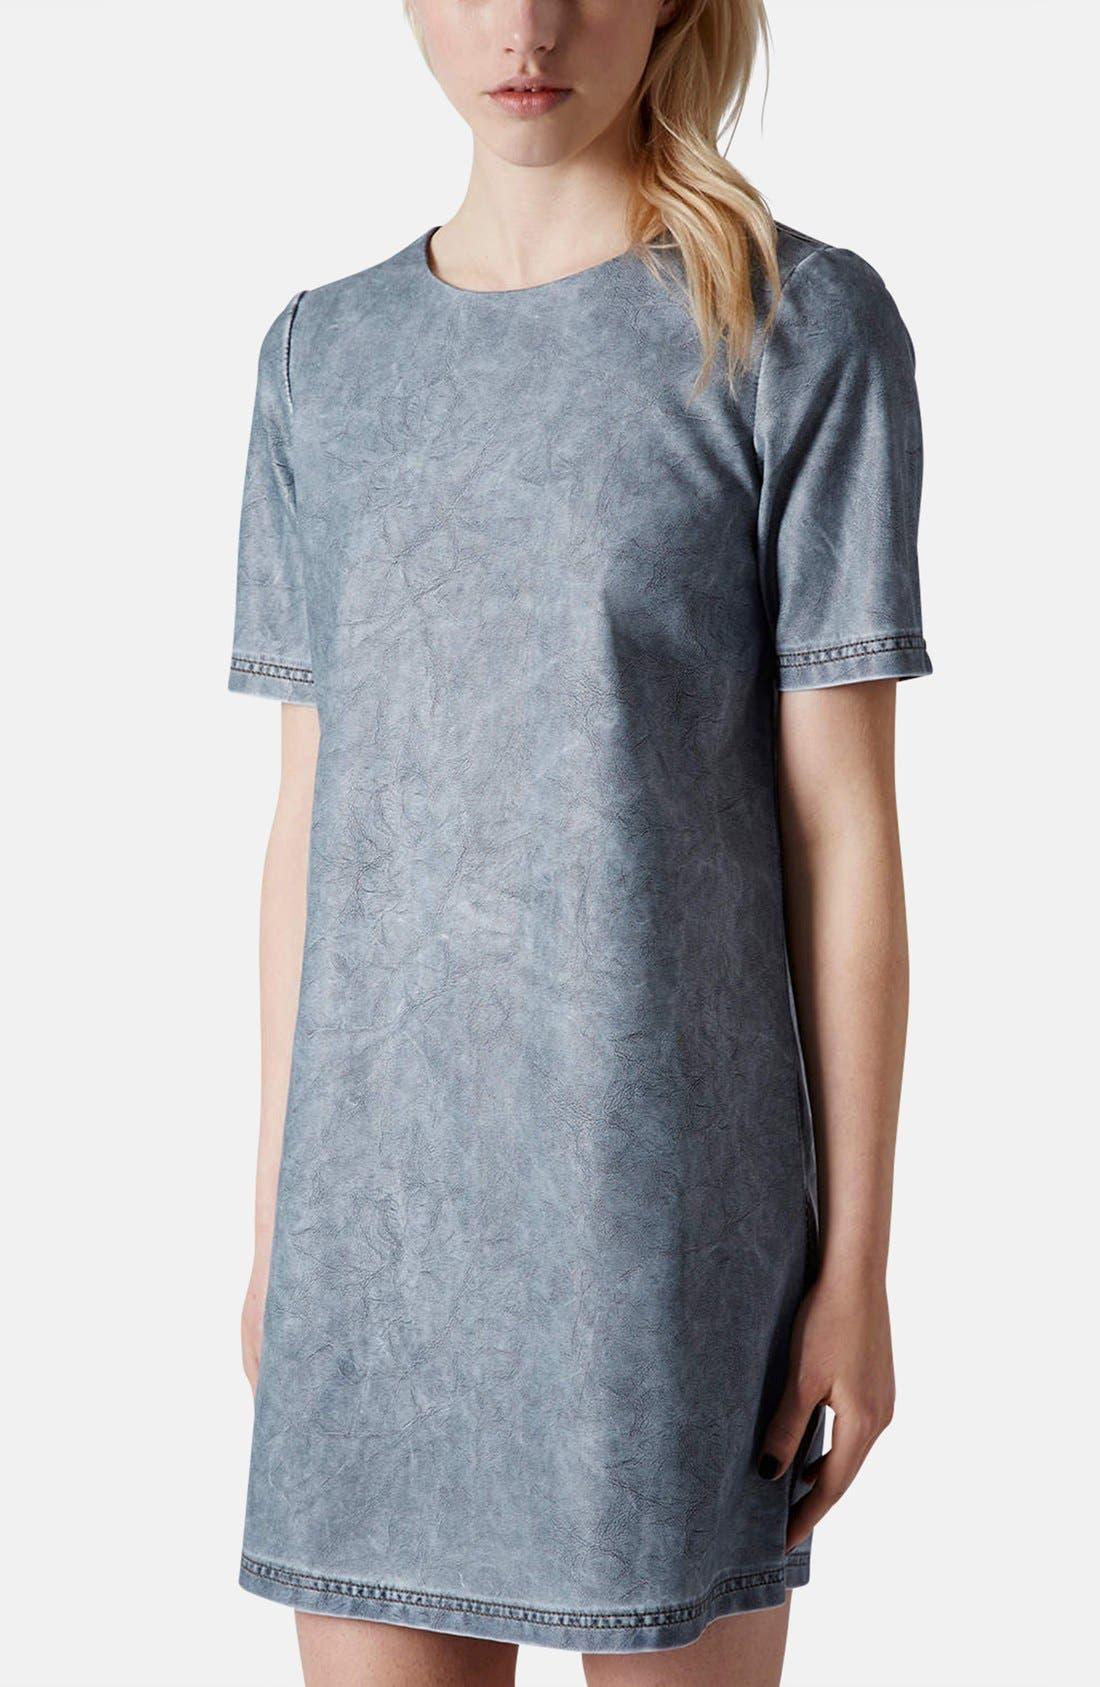 Main Image - Topshop 'Daloma' Faux Leather Shift Dress